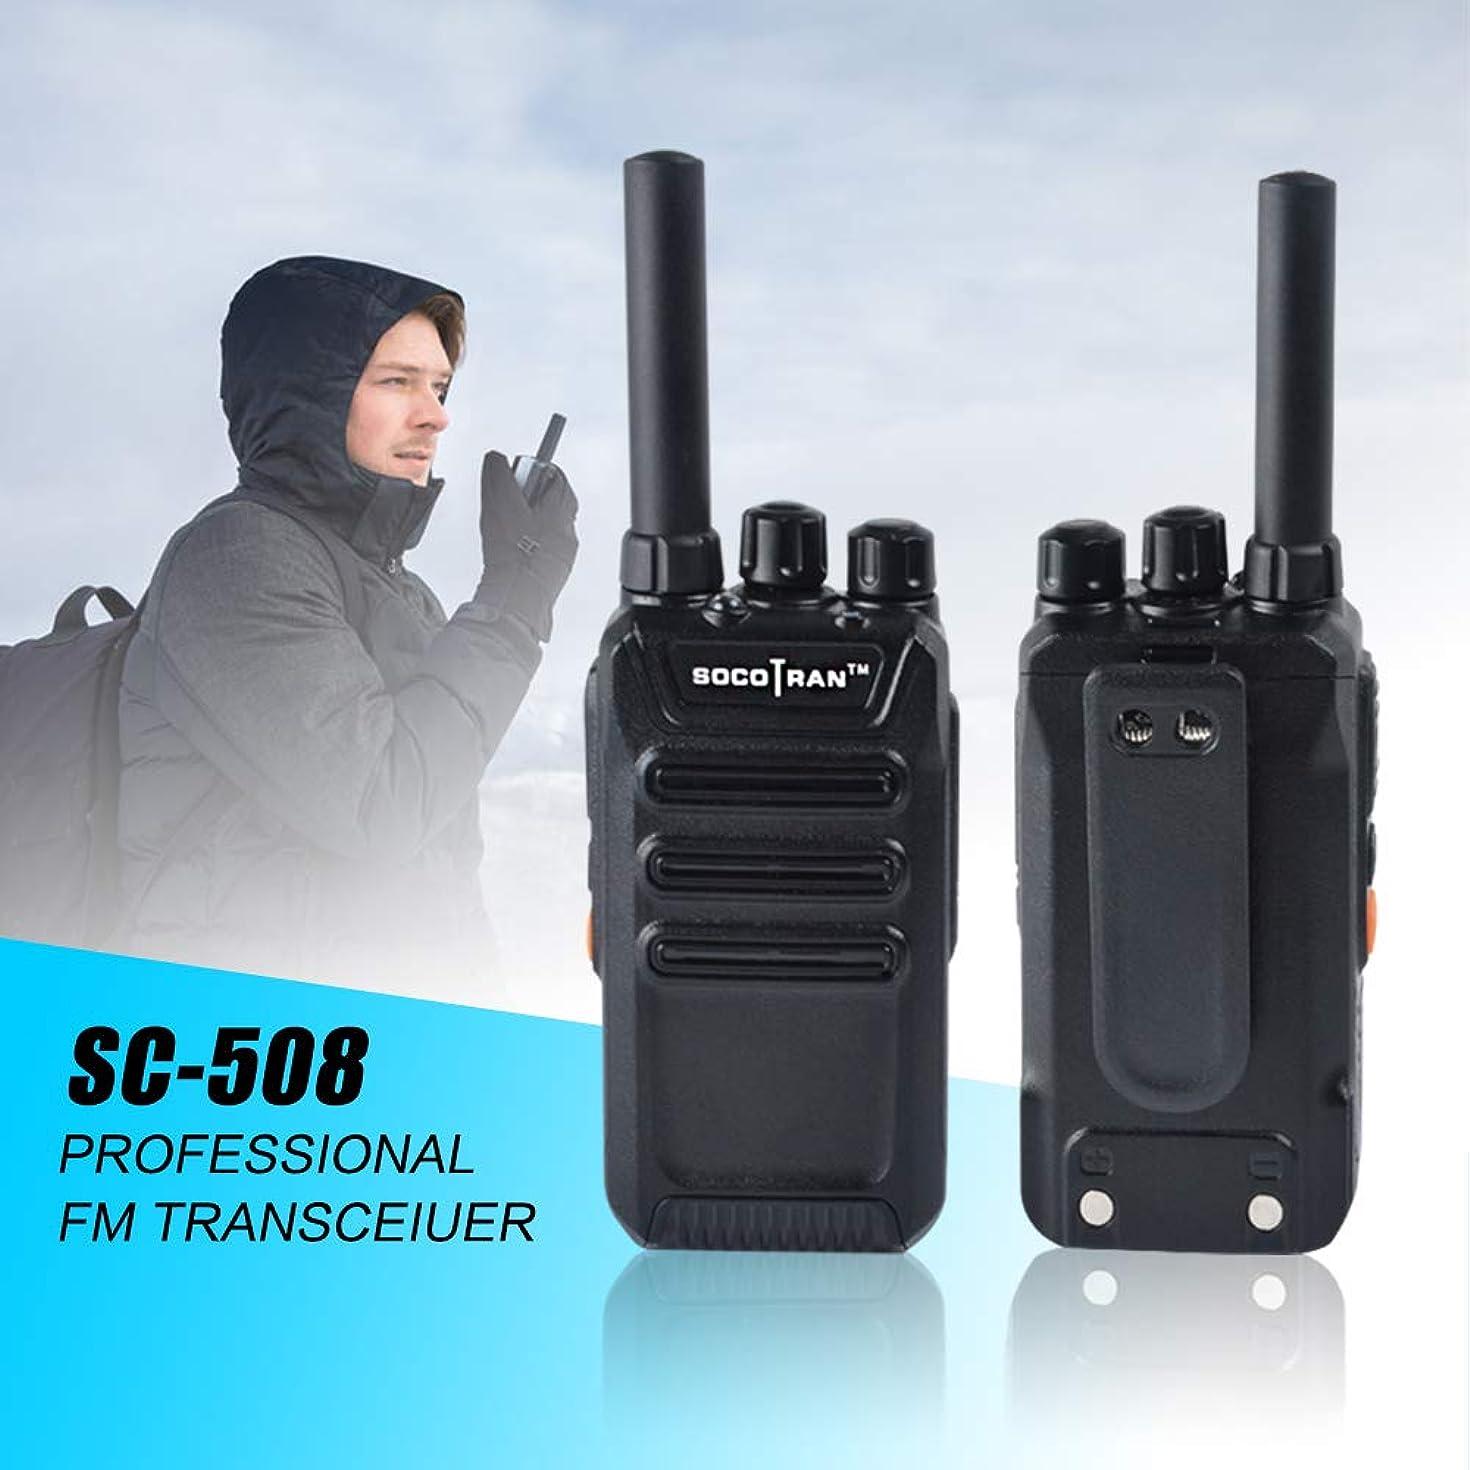 Ham Radio Portable Two-Way Radio UHF 400-470MHz Mini Walkie Talkie 2W Long Range 2 Way Radio with Rechargeable Li-ion Battery VOX Scramble for Outdoor & Indoor (Black, 2Pack) SOCOTRAN